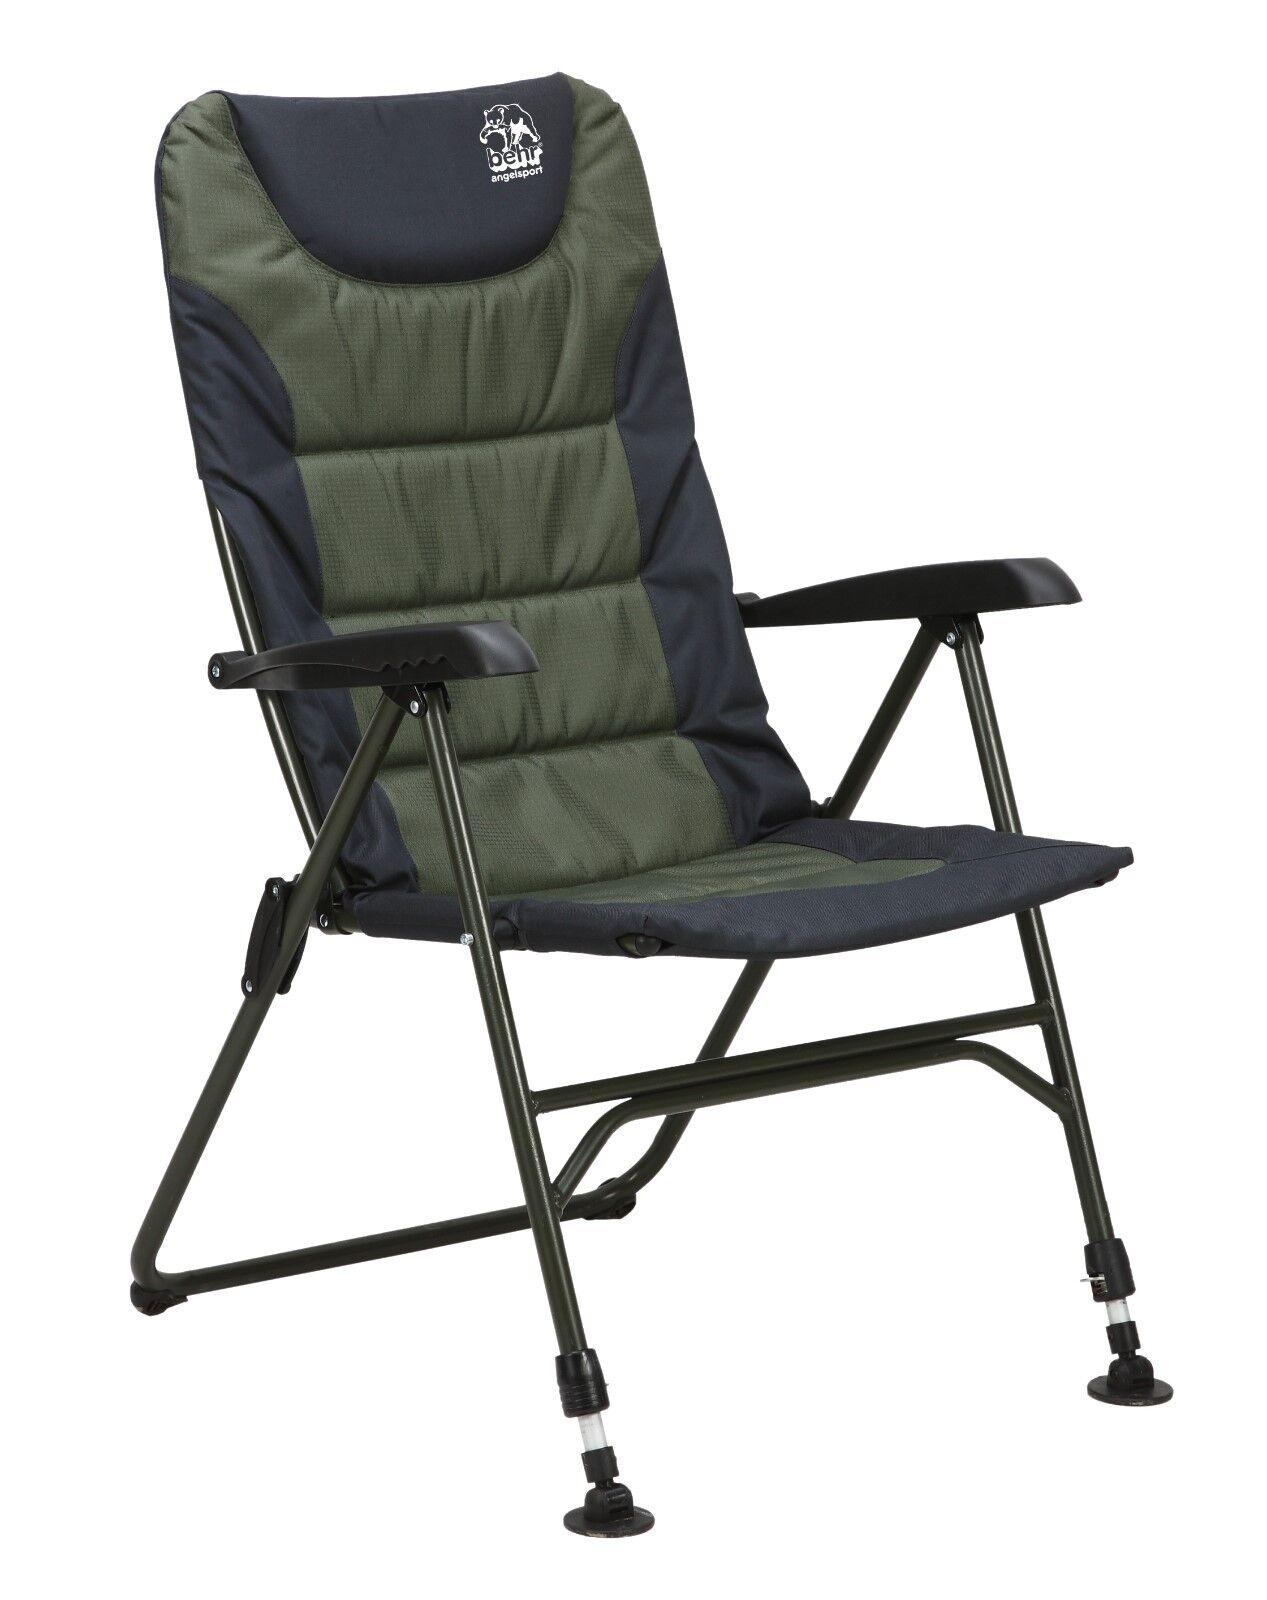 Behr Anglerstuhl Trendex Comfort Comfort Comfort Telescopic PLUS Angelstuhl Campingstuhl 9116013 0adb54